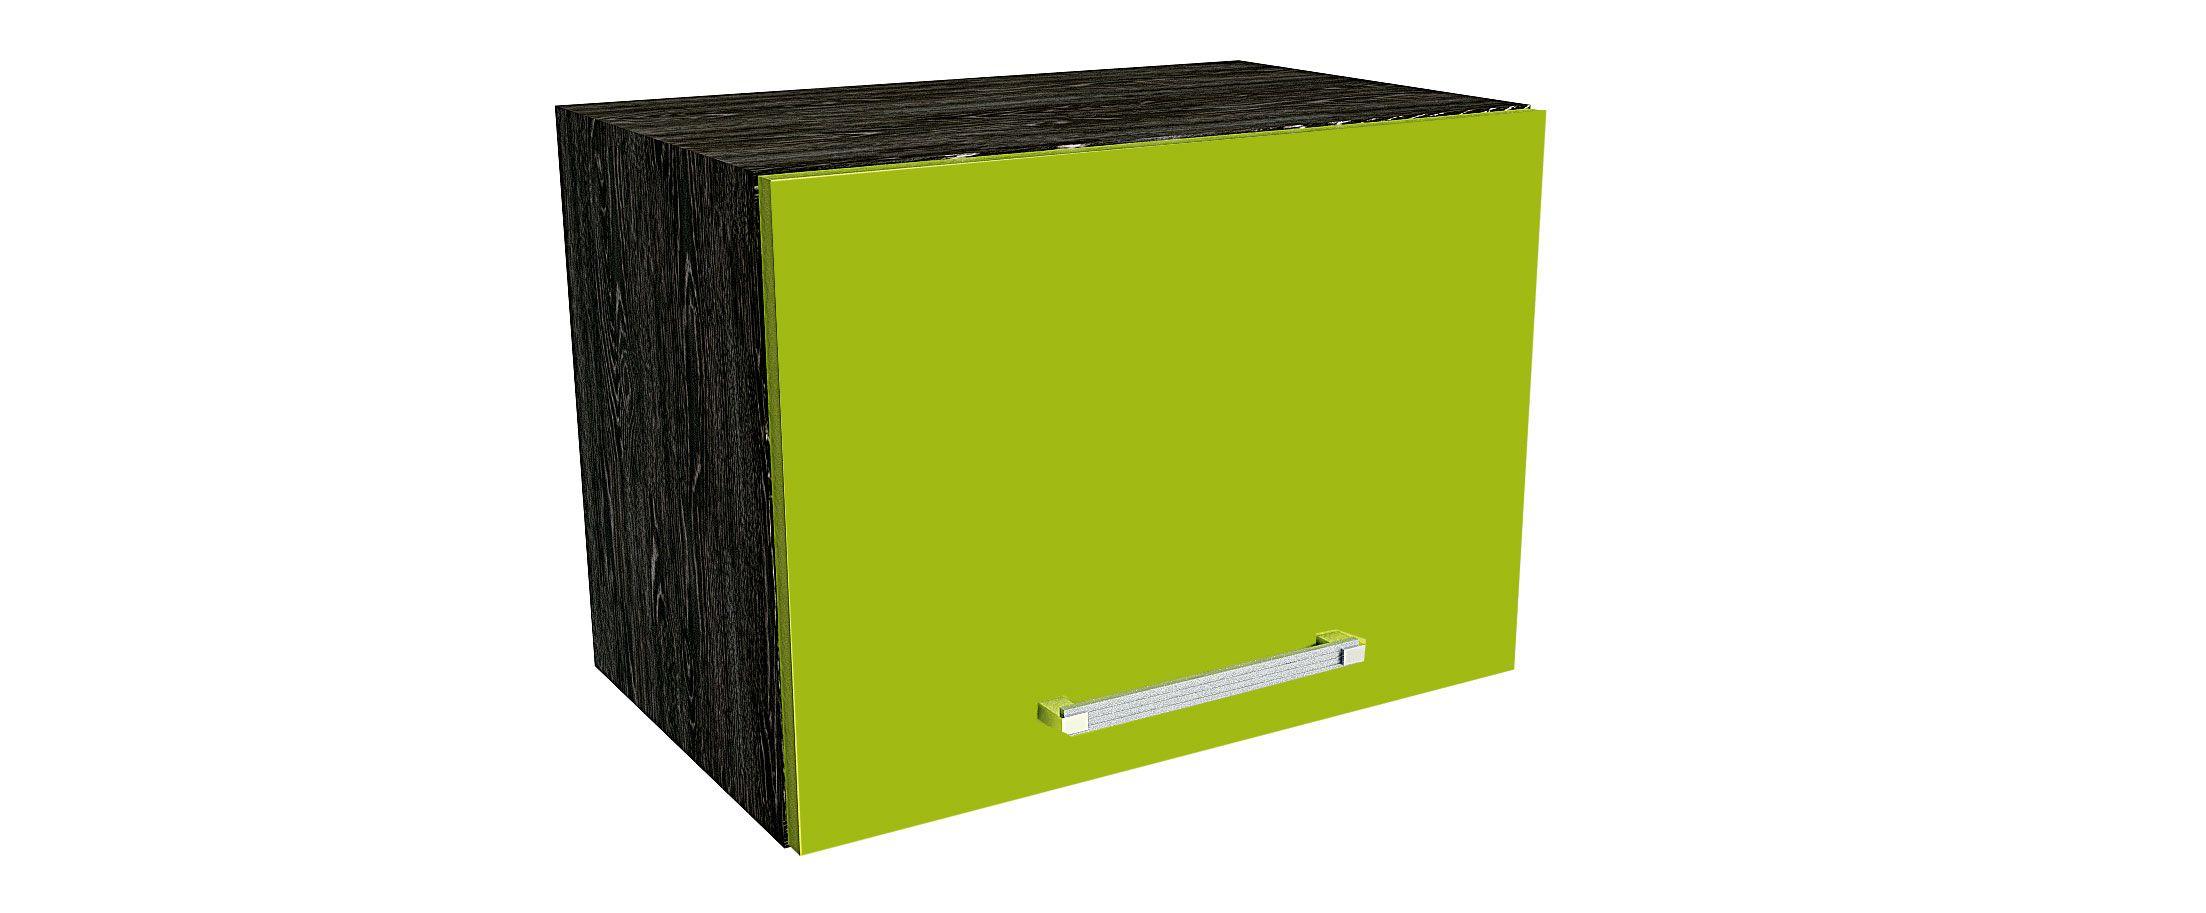 Шкаф навесной Марсела лайм Модель 709 от MOON TRADE